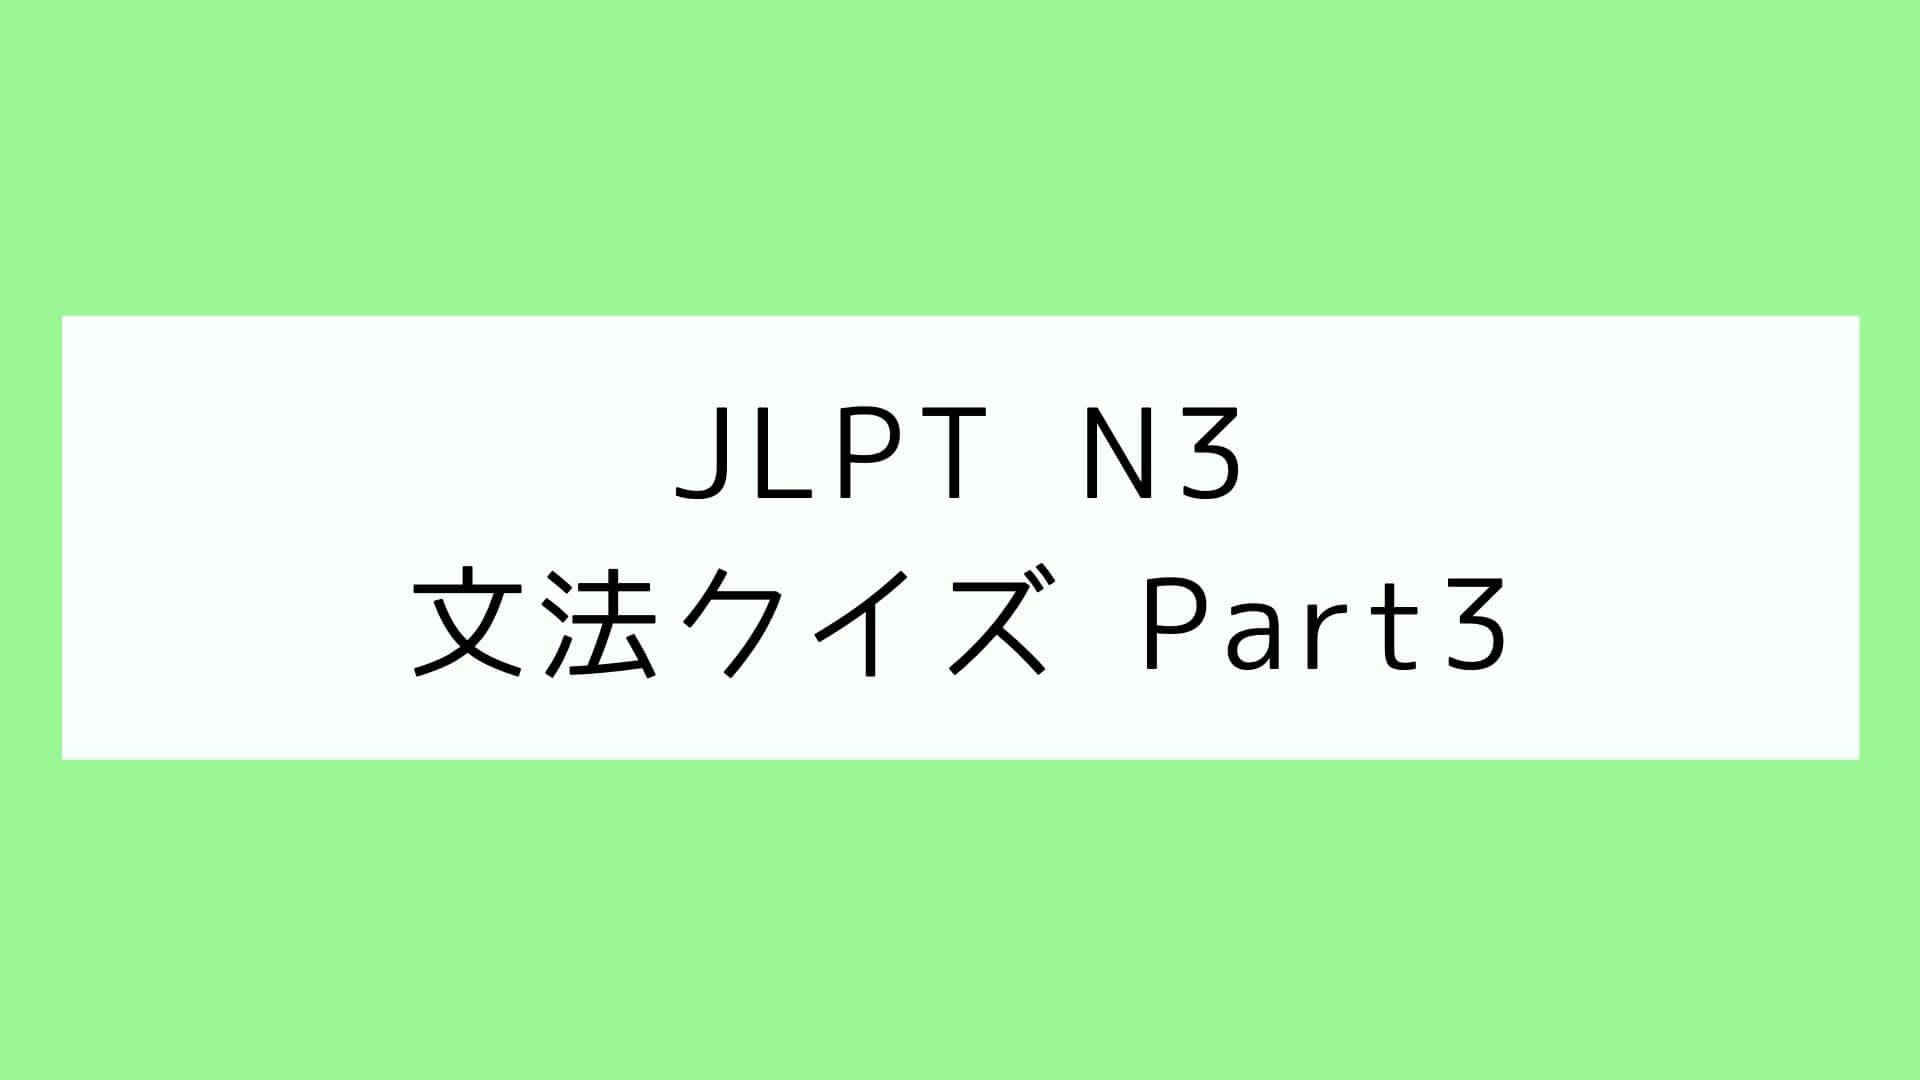 【JLPT N3】文法クイズ Part3